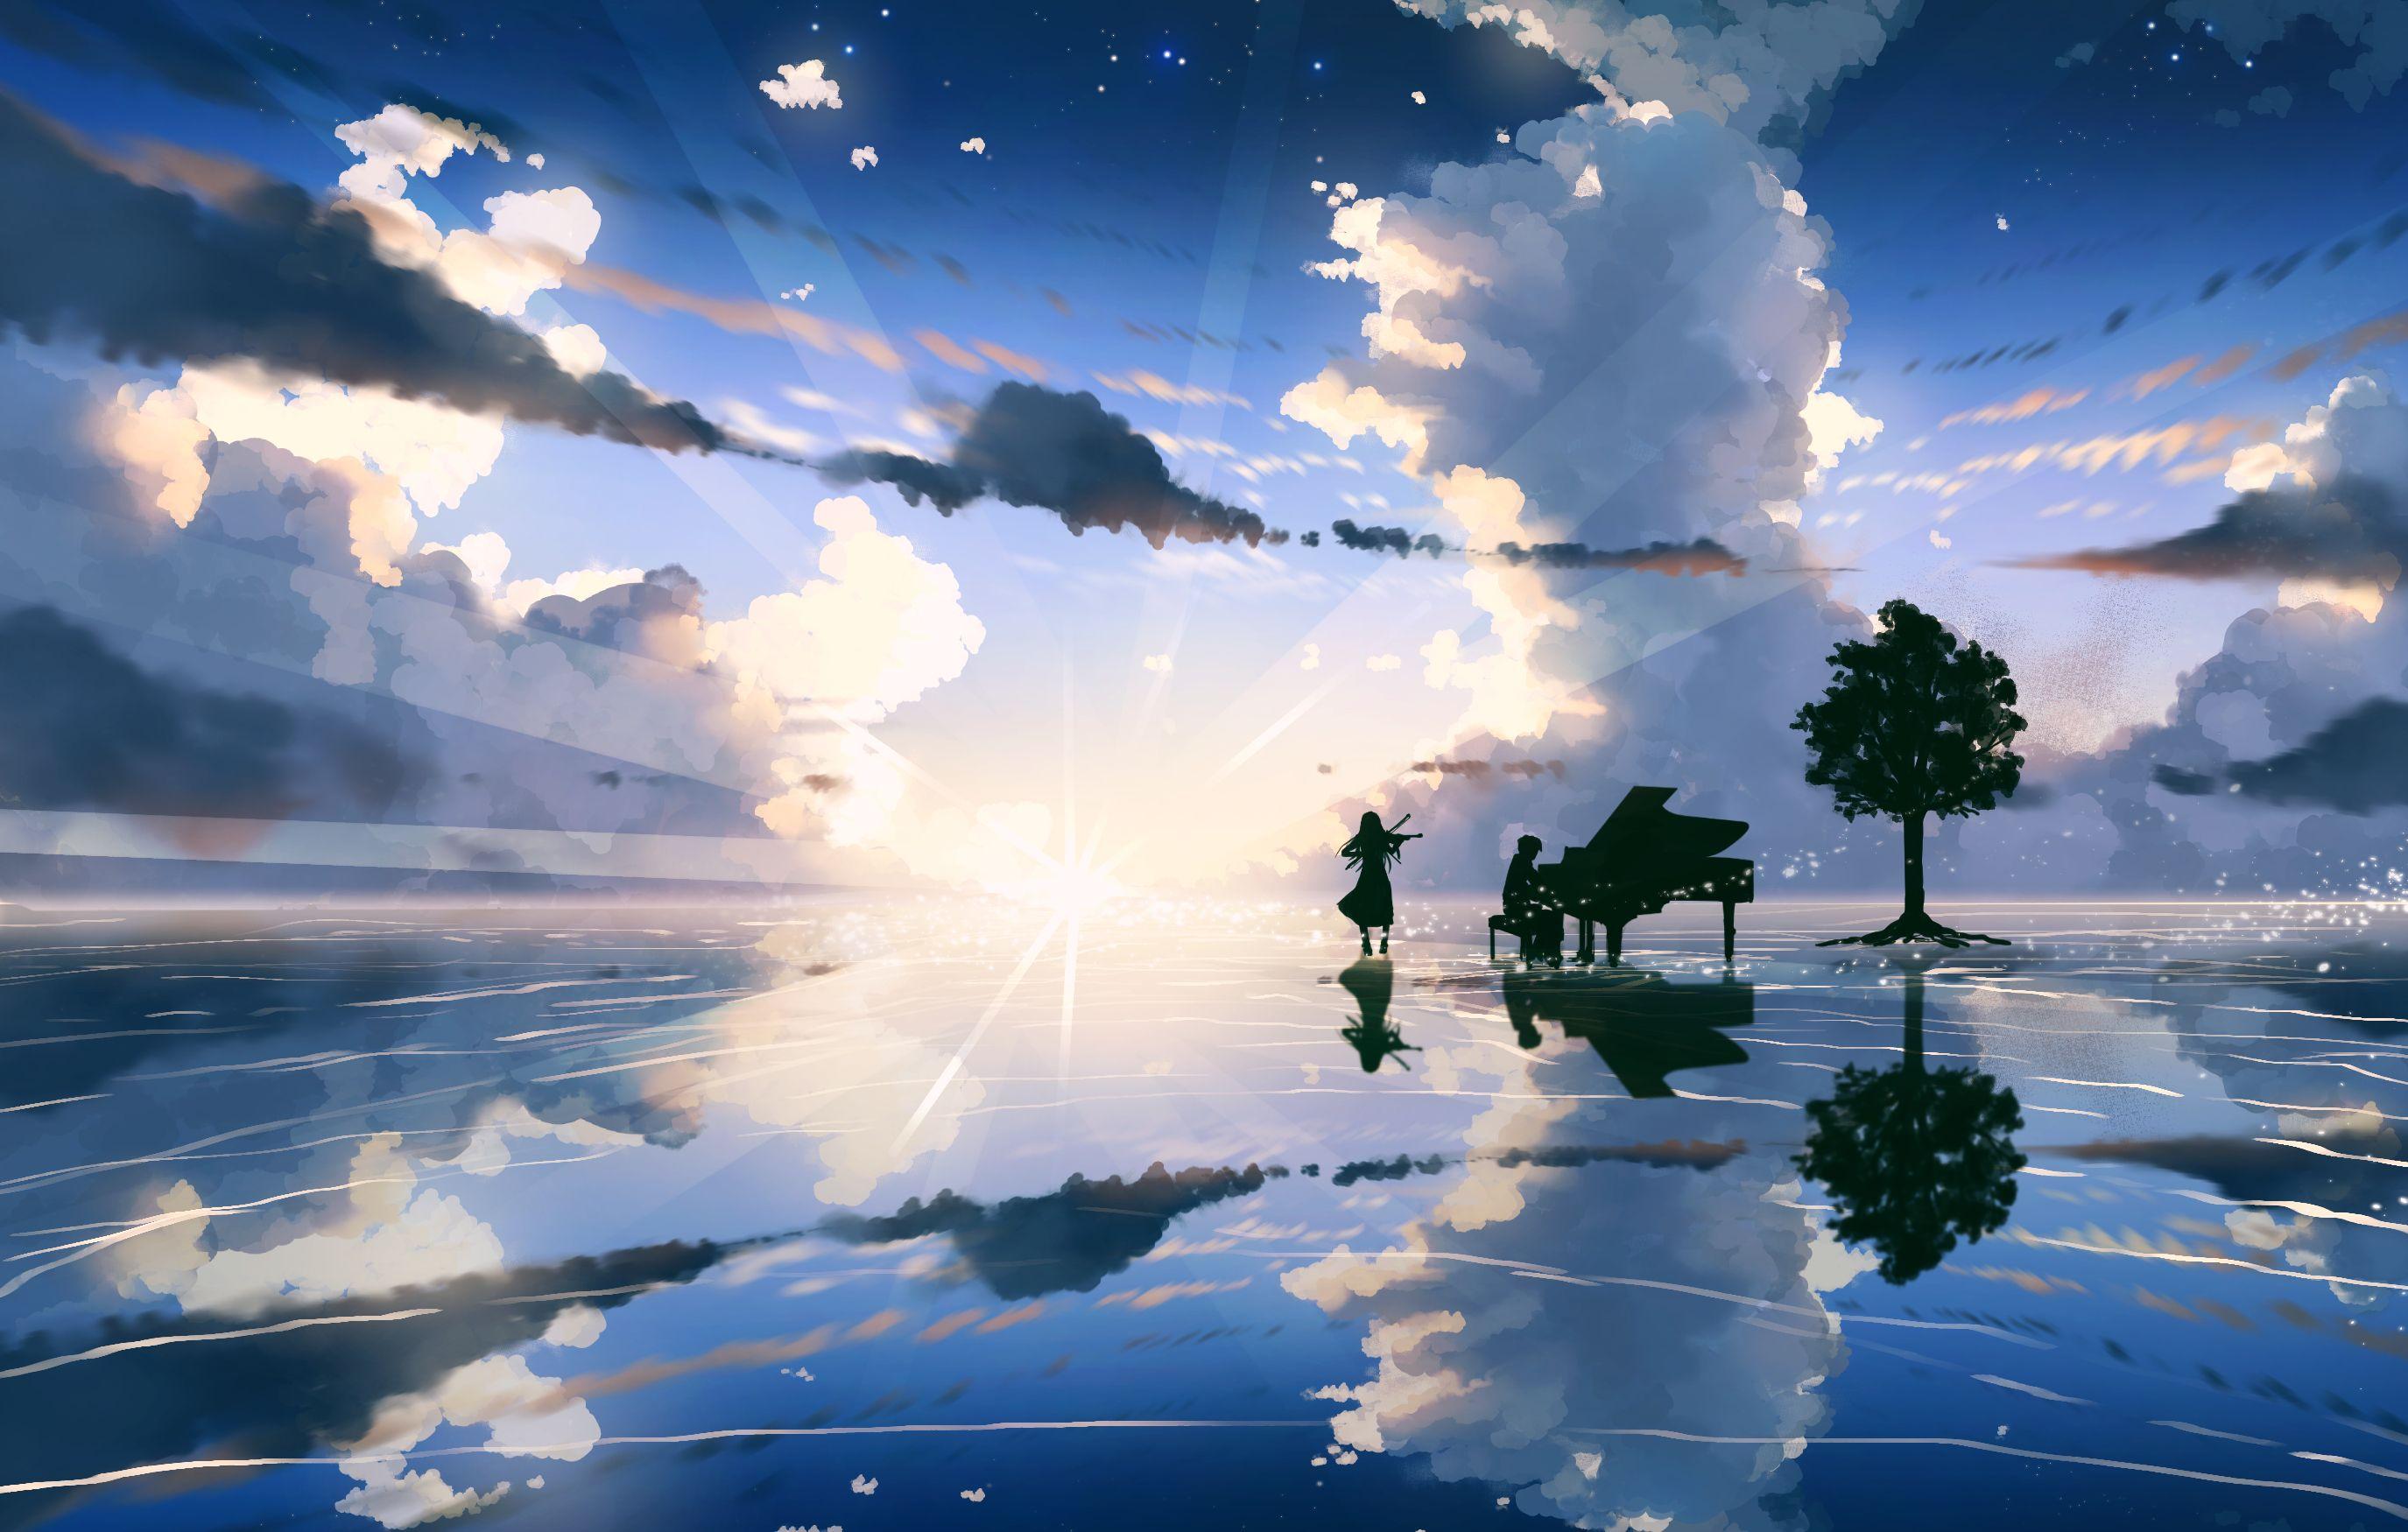 Pin by AnimeMasta 🙃 on ️Your lie in April ️ Anime